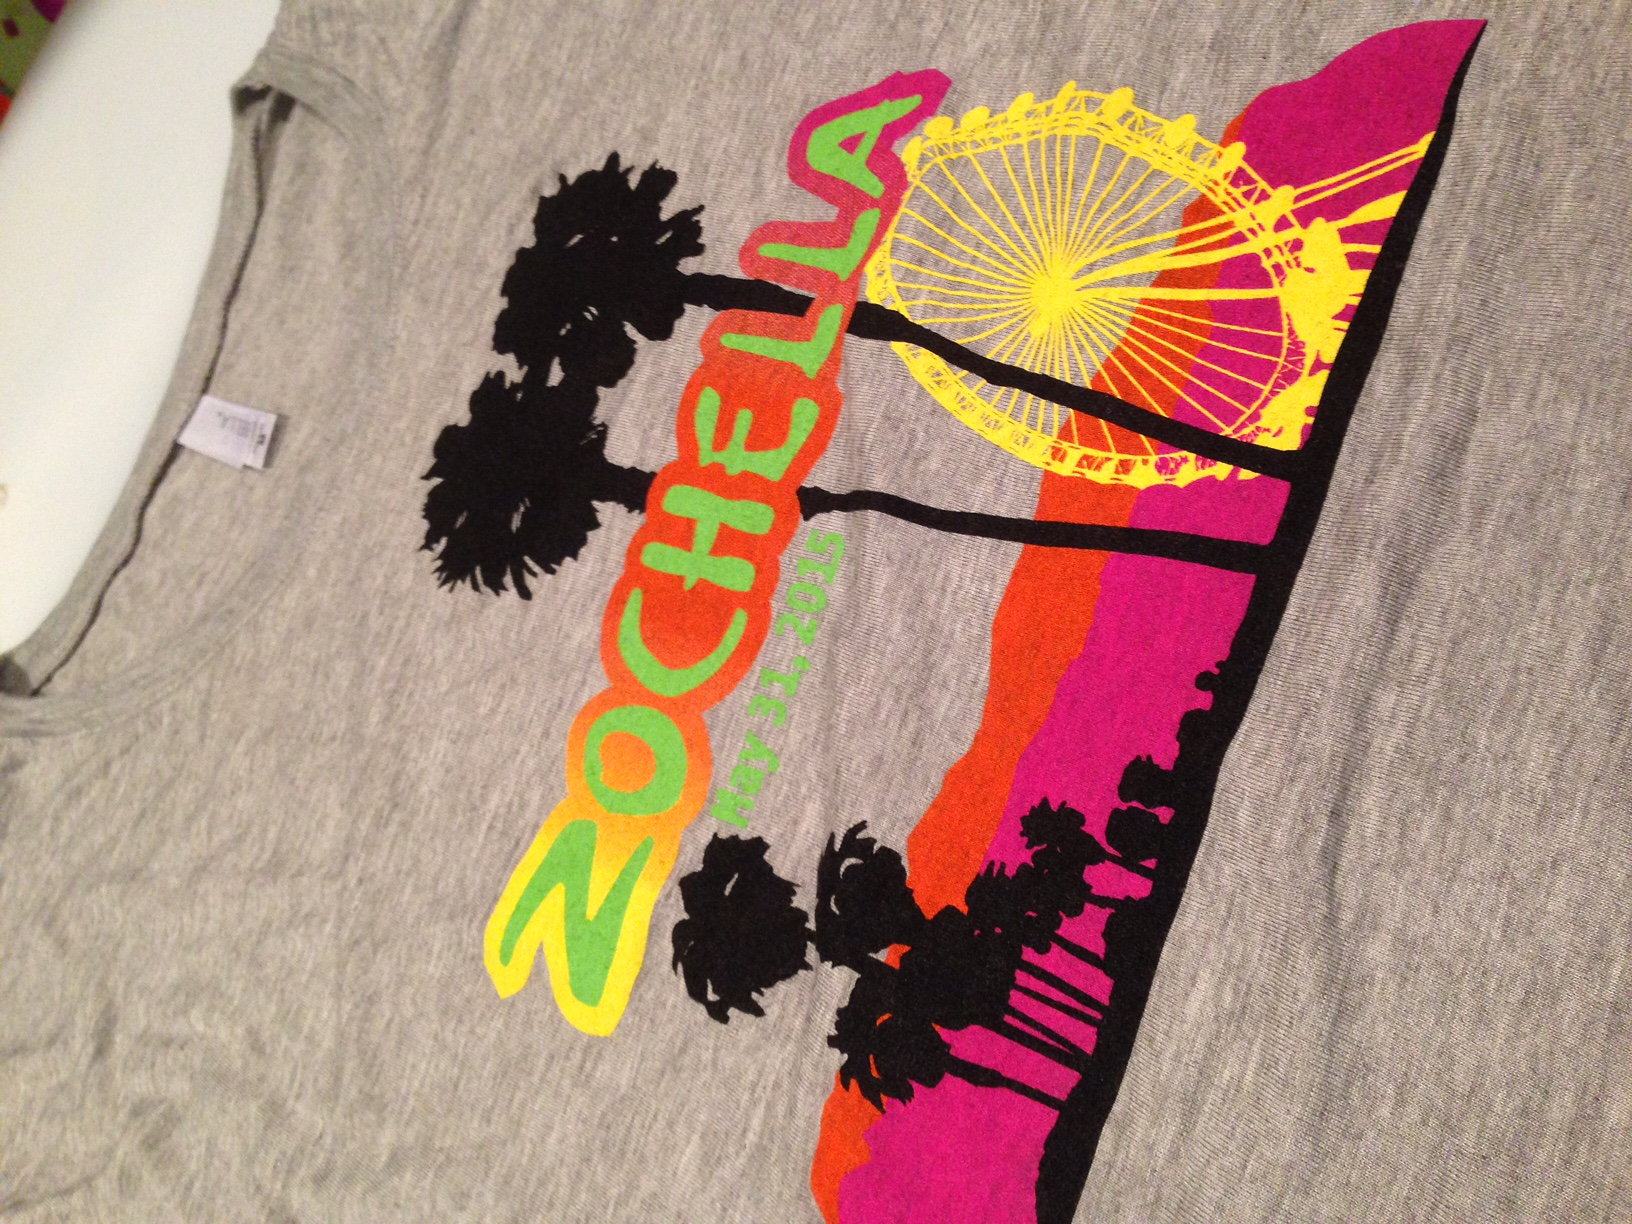 Coachella themed Bat Mitzvah at Michigan Shores - Kleifield Design & Associates, Inc.